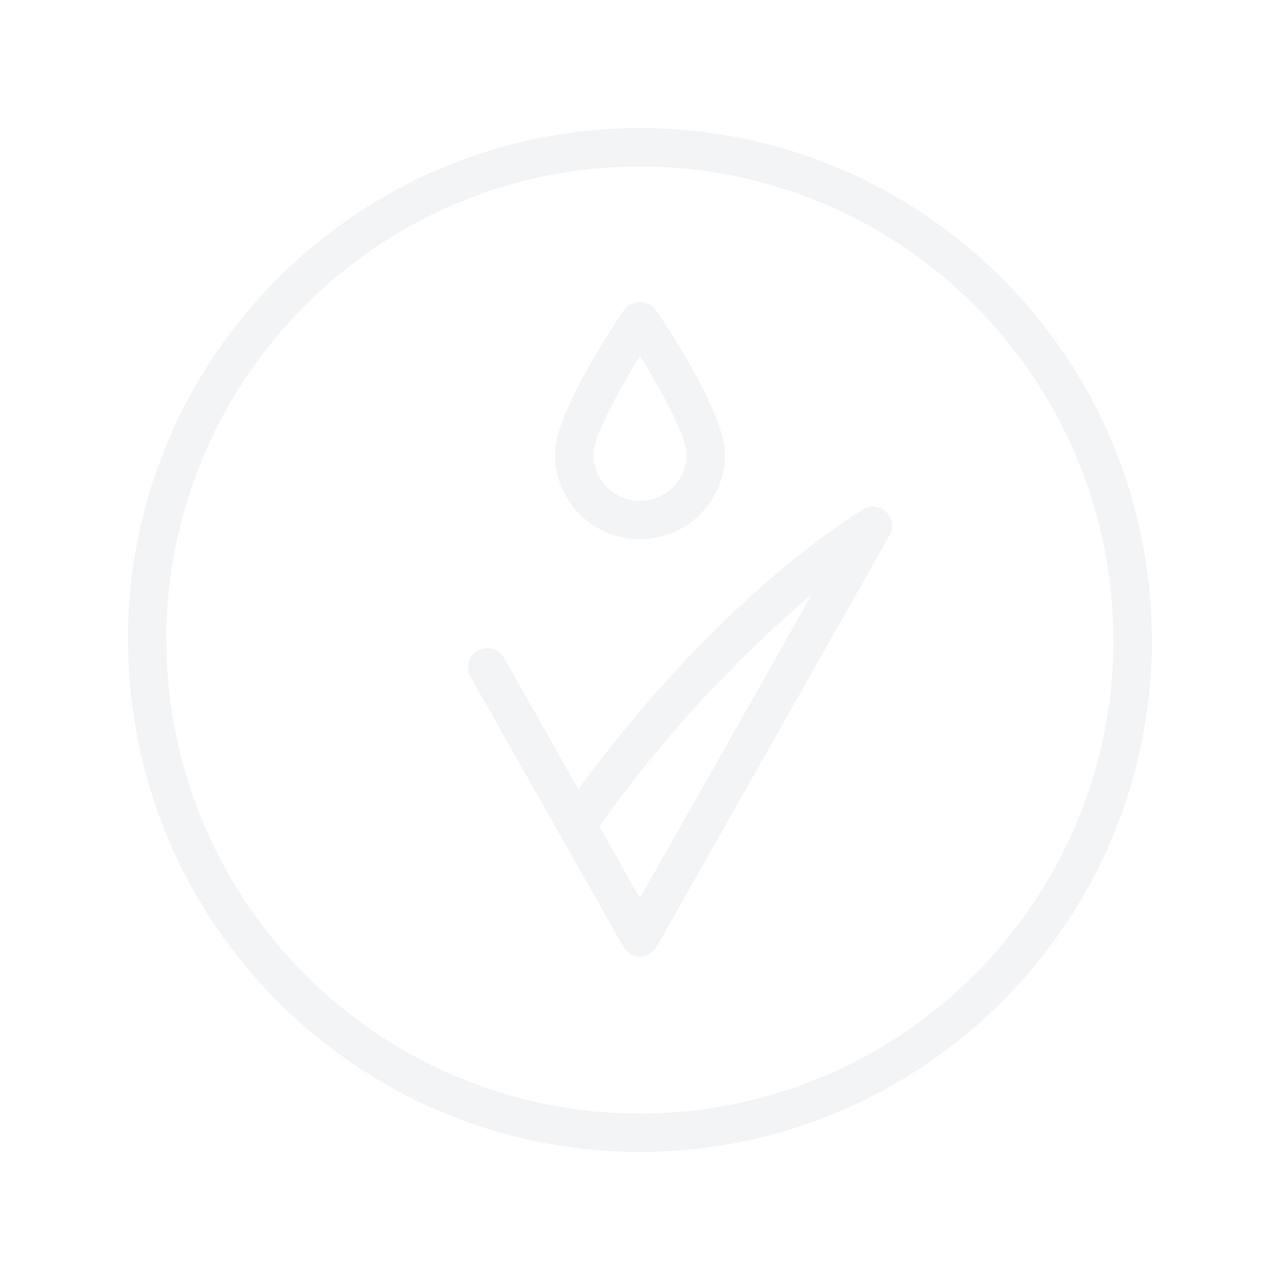 Dior Diorshow Waterproof Volume Mascara No.090 Catwalk Black 11.5ml